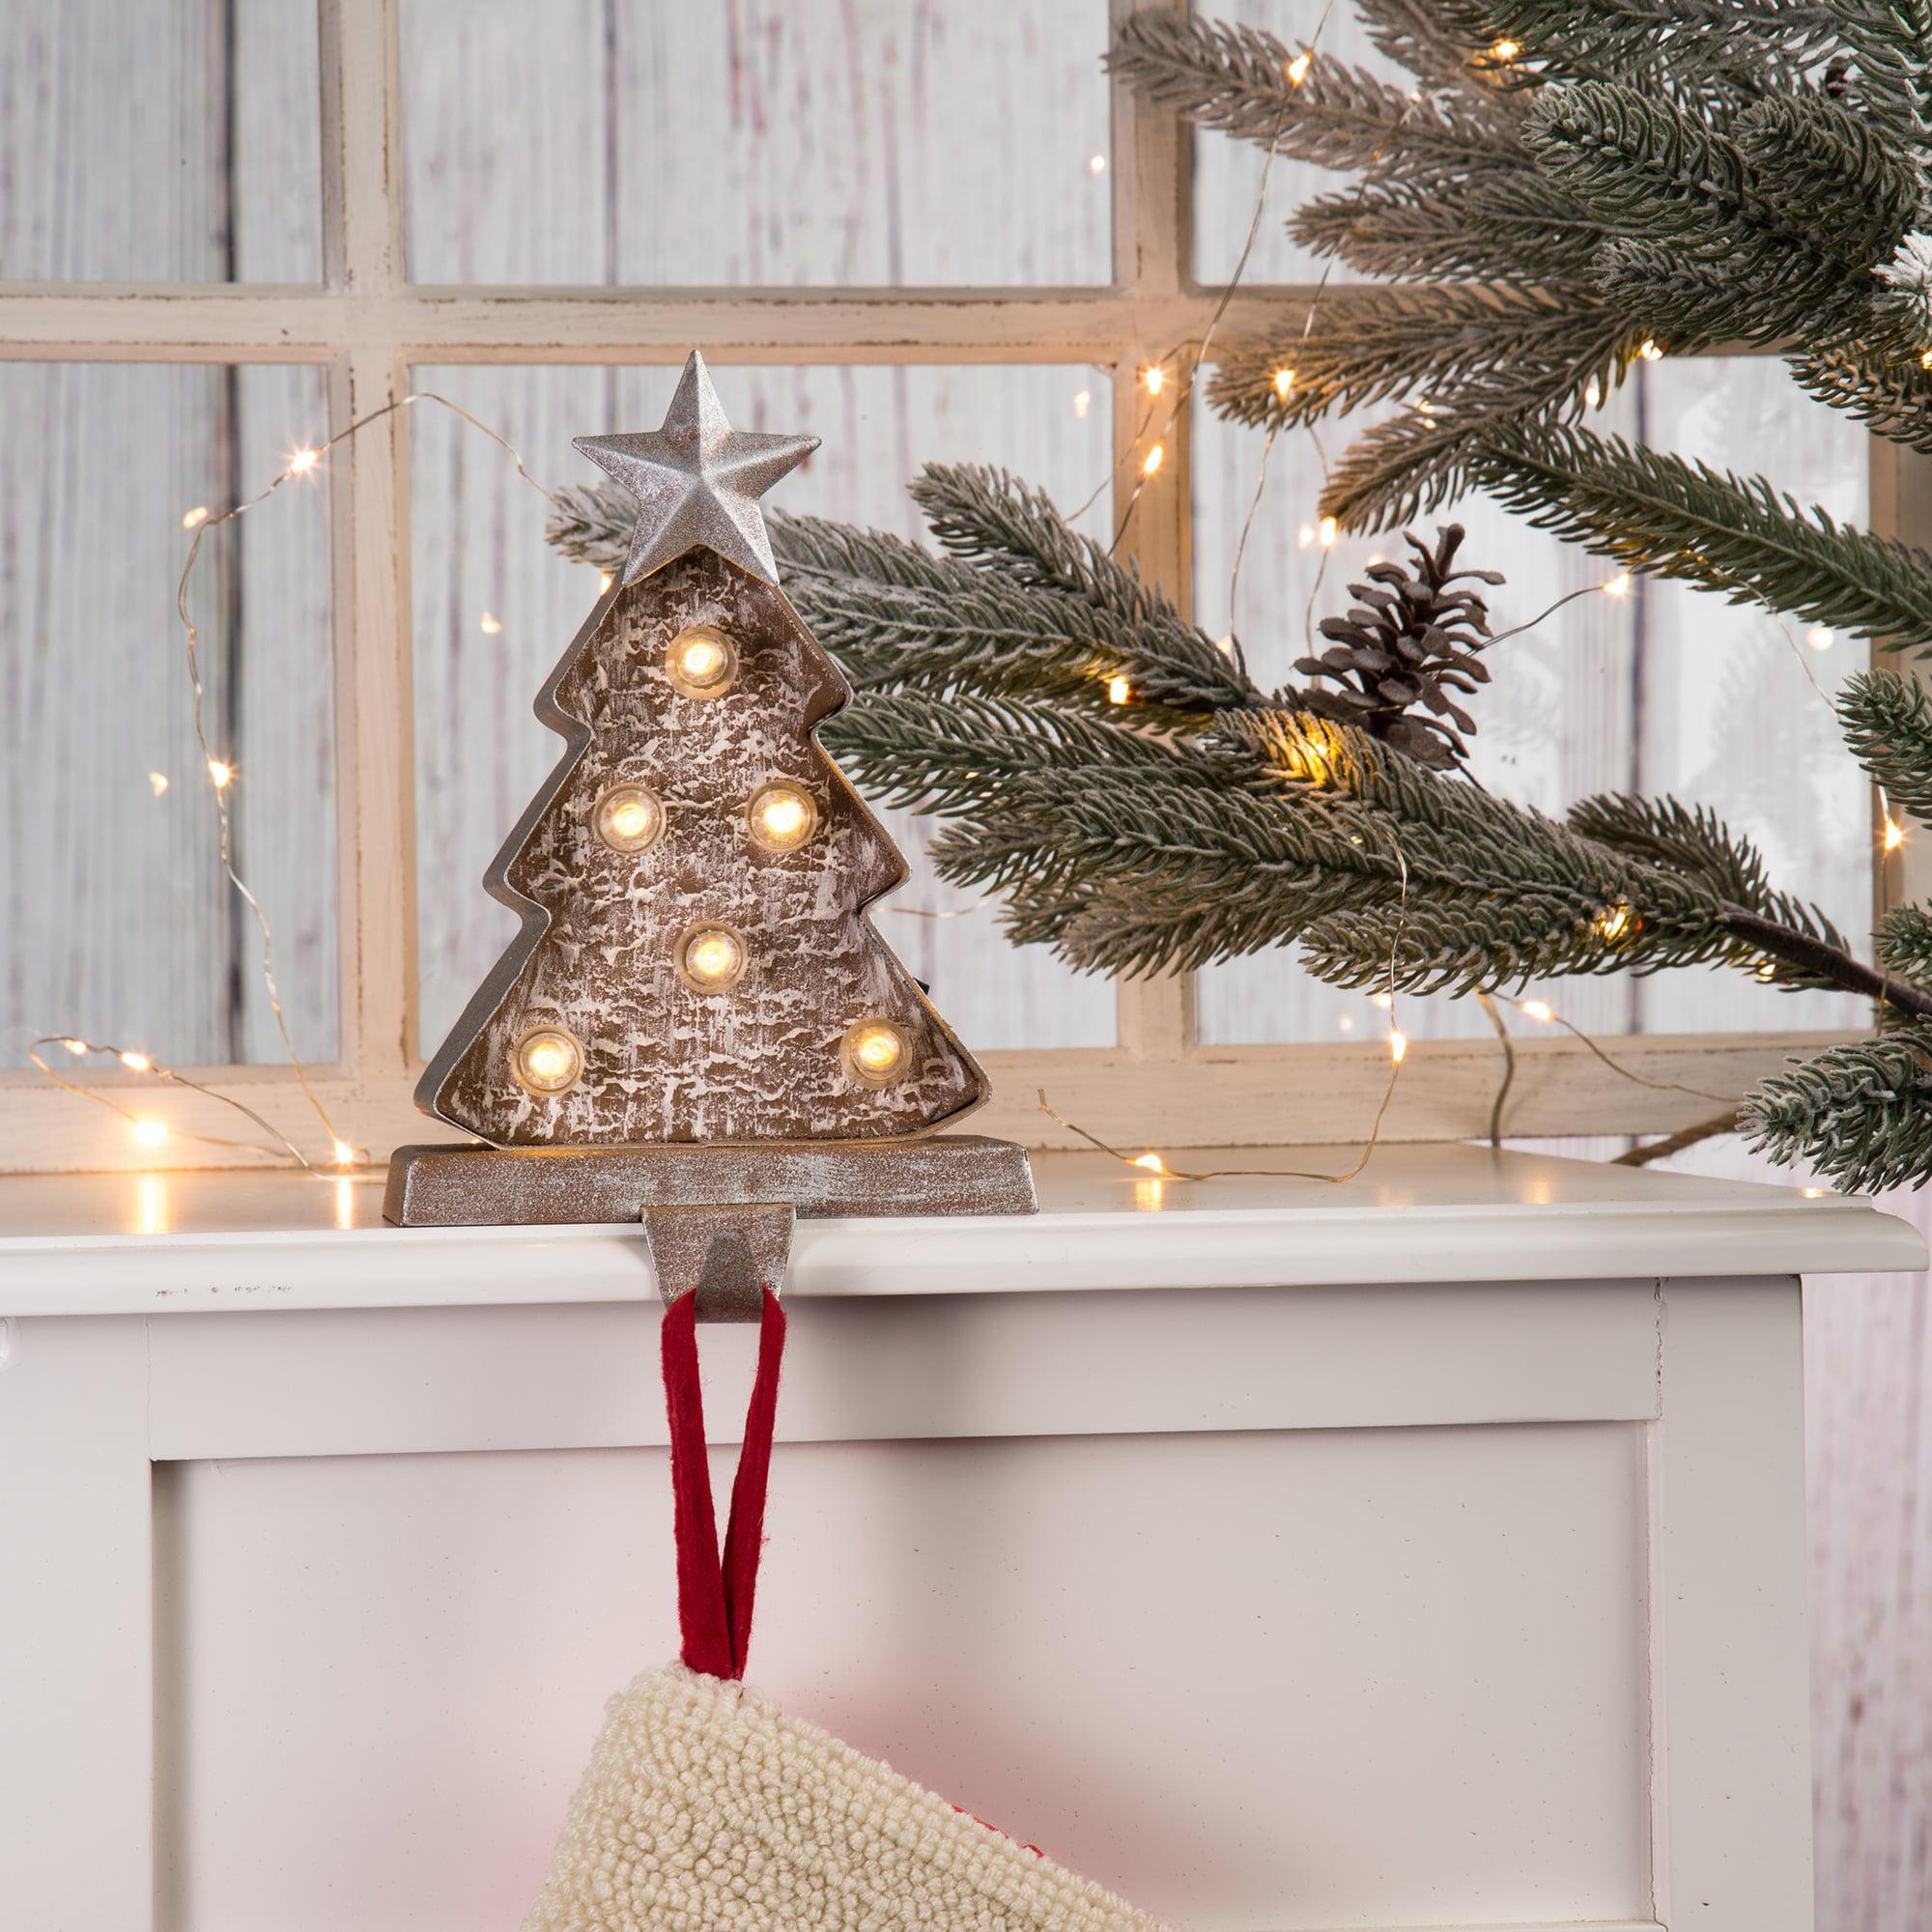 Glitzhome 7 5 H Marquee Led Lighted Christmas Stocking Holder Tree Walmart Com Walmart Com